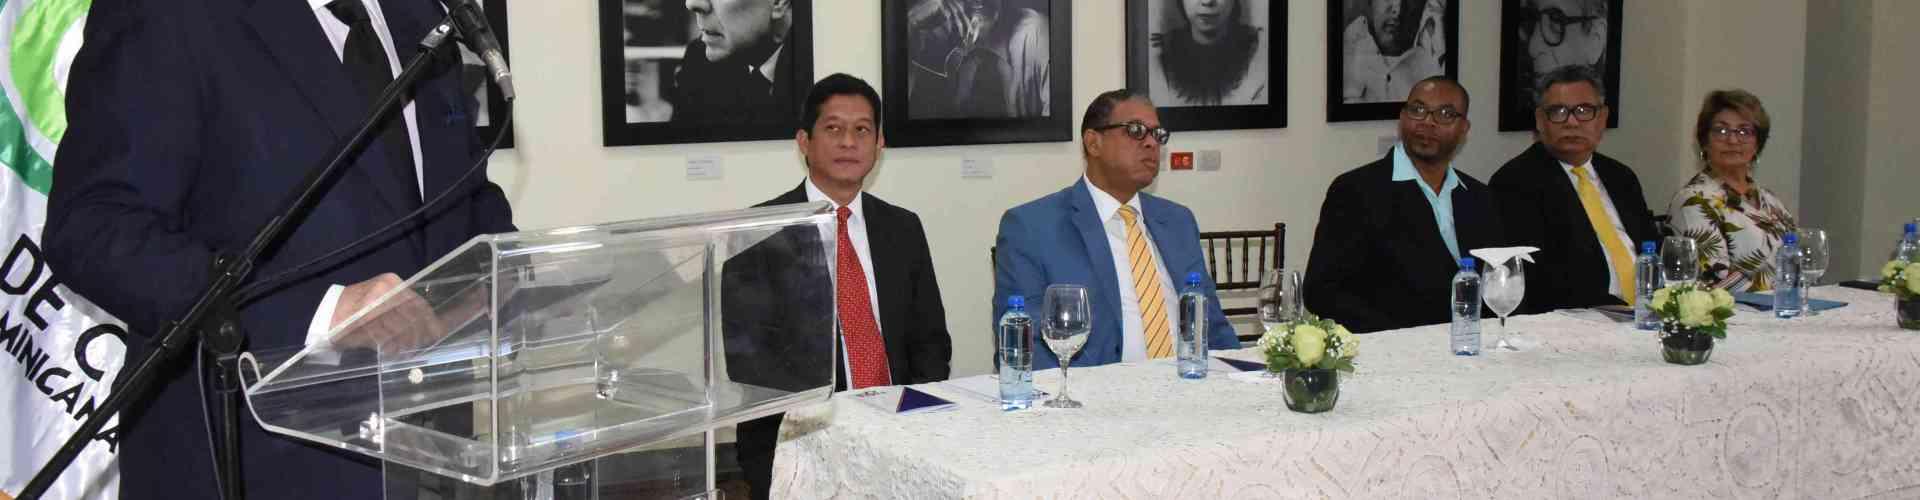 Ministro Cultura apoya sector artesanal